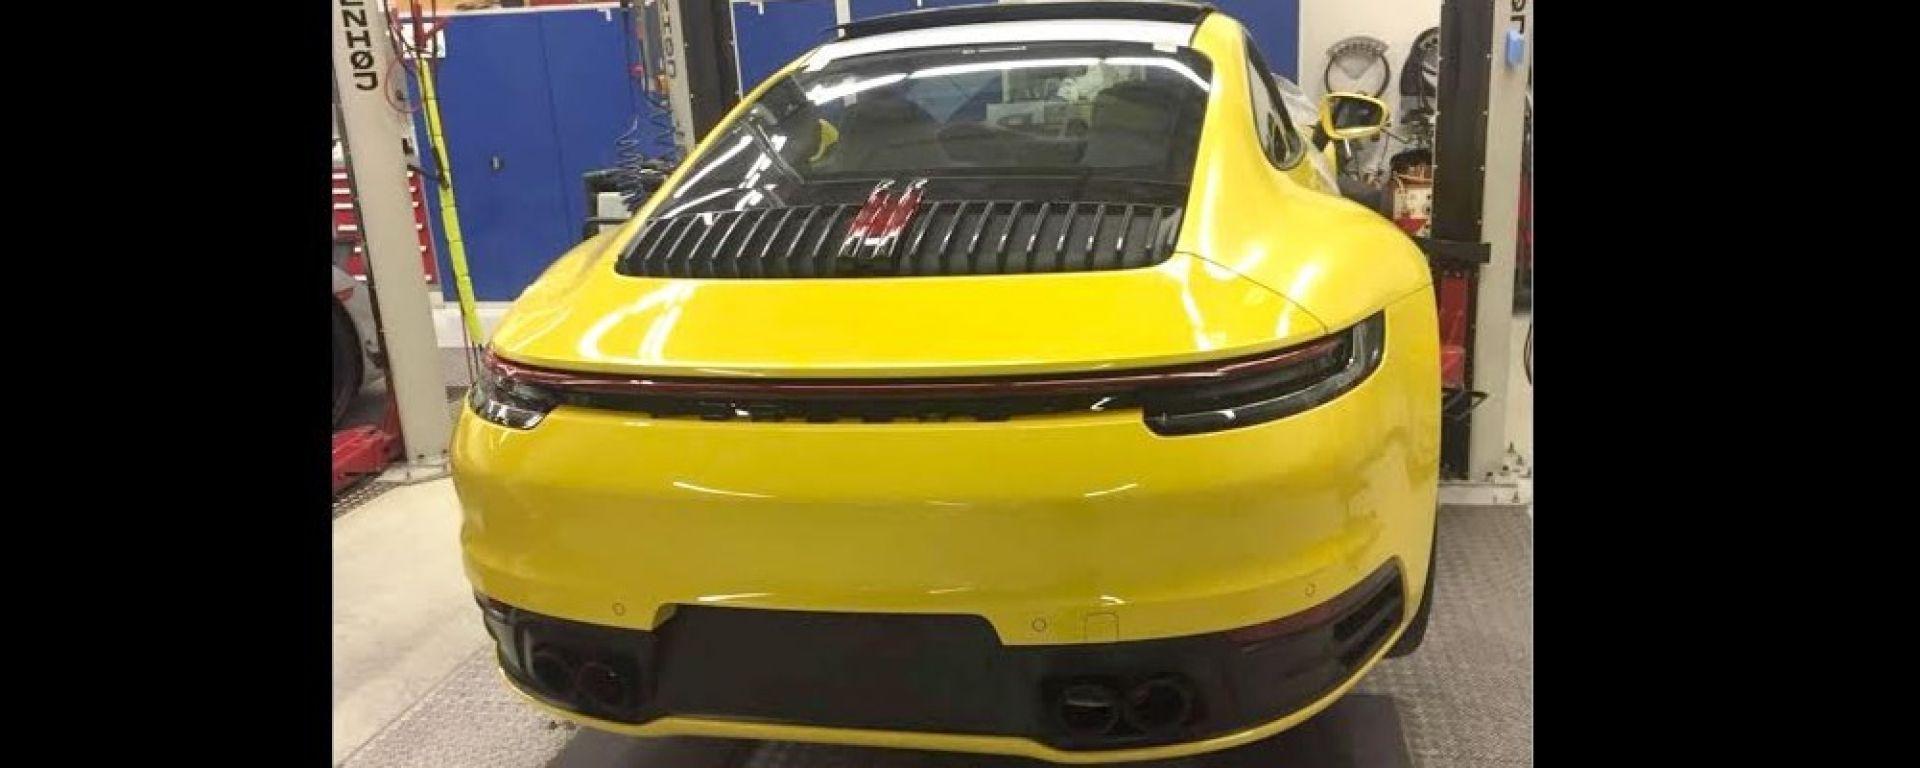 La Porsche 992 si svela su Instagram